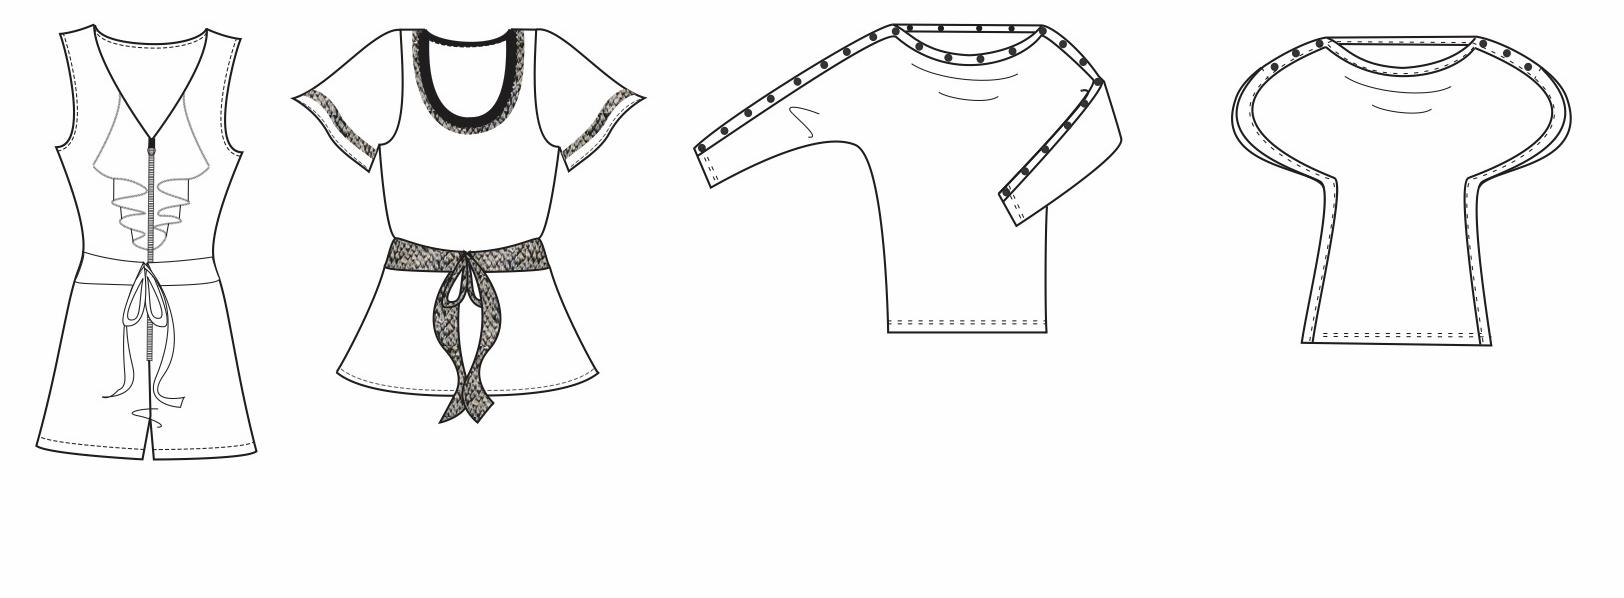 tech drawing 2.jpg